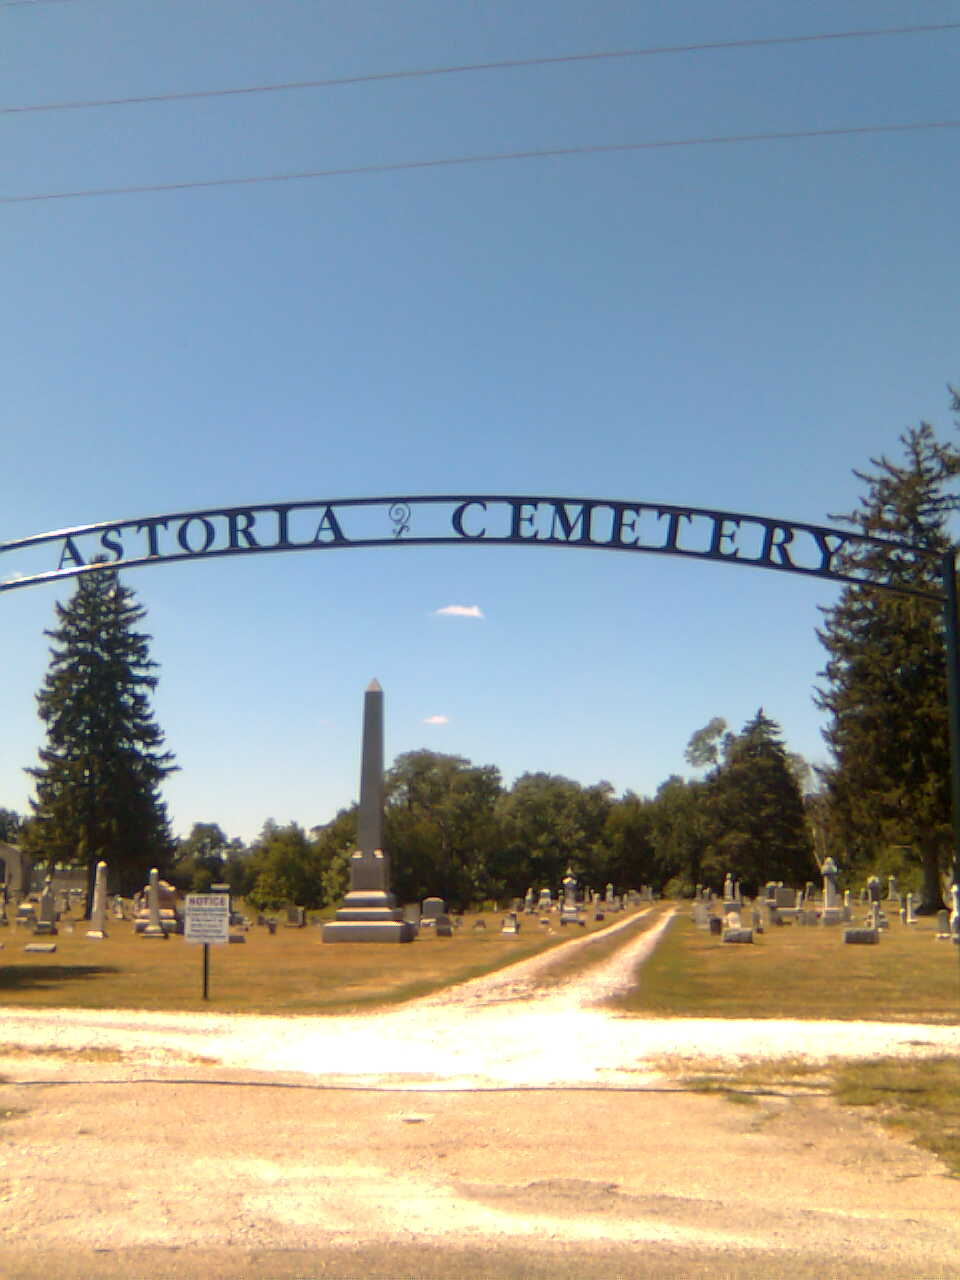 Astoria Cemetery